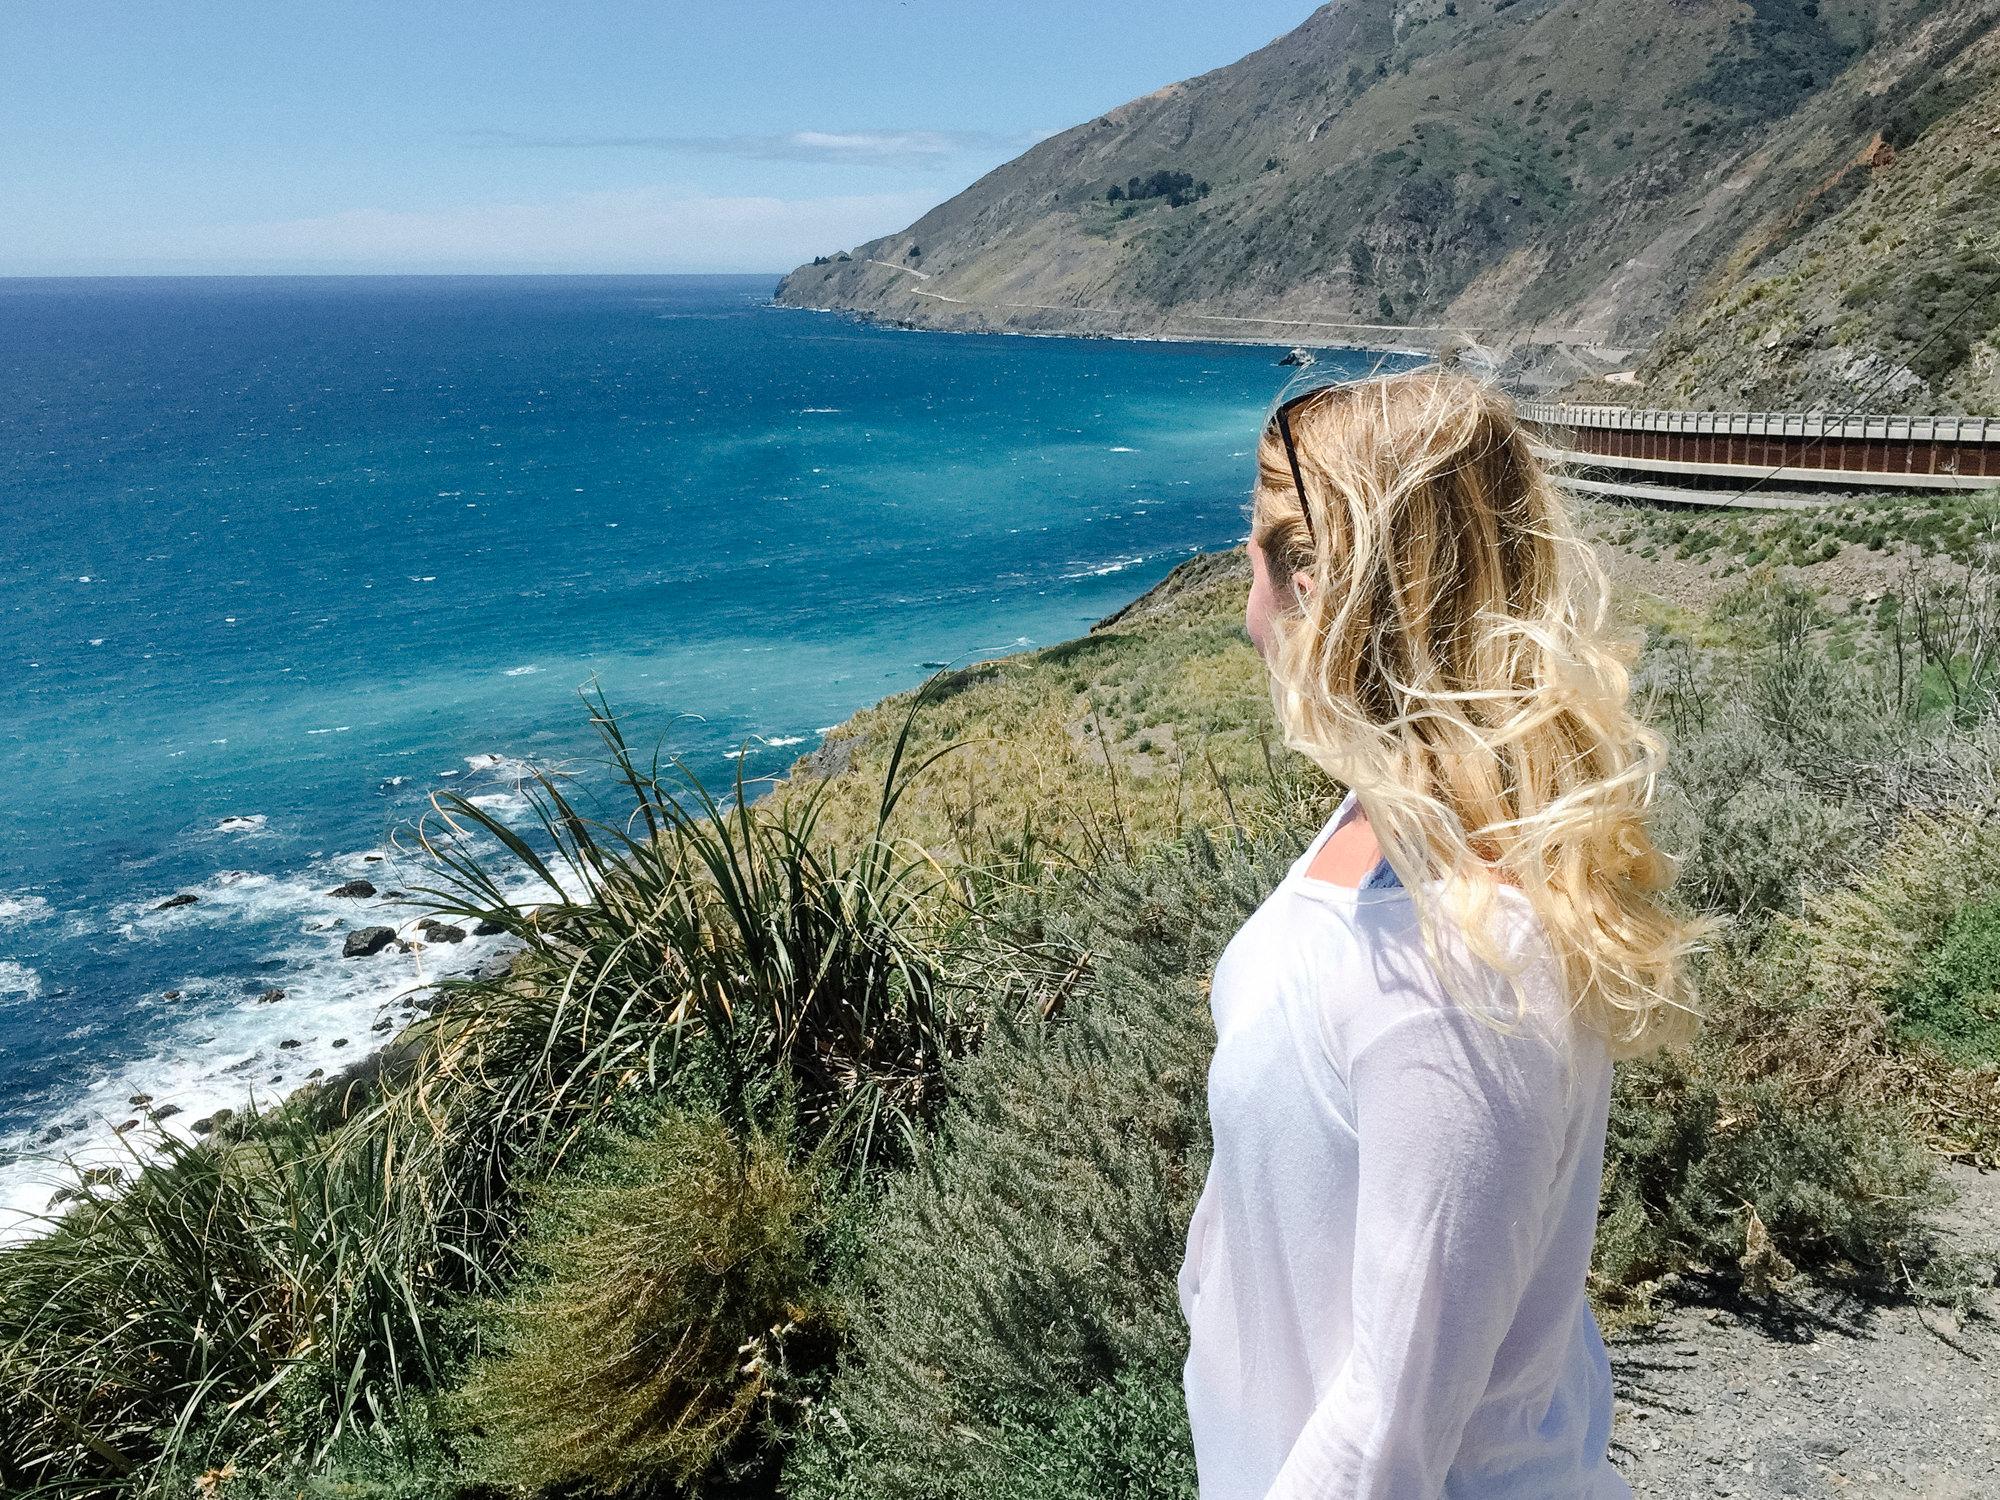 pacific_coast_road_trip-4.jpg